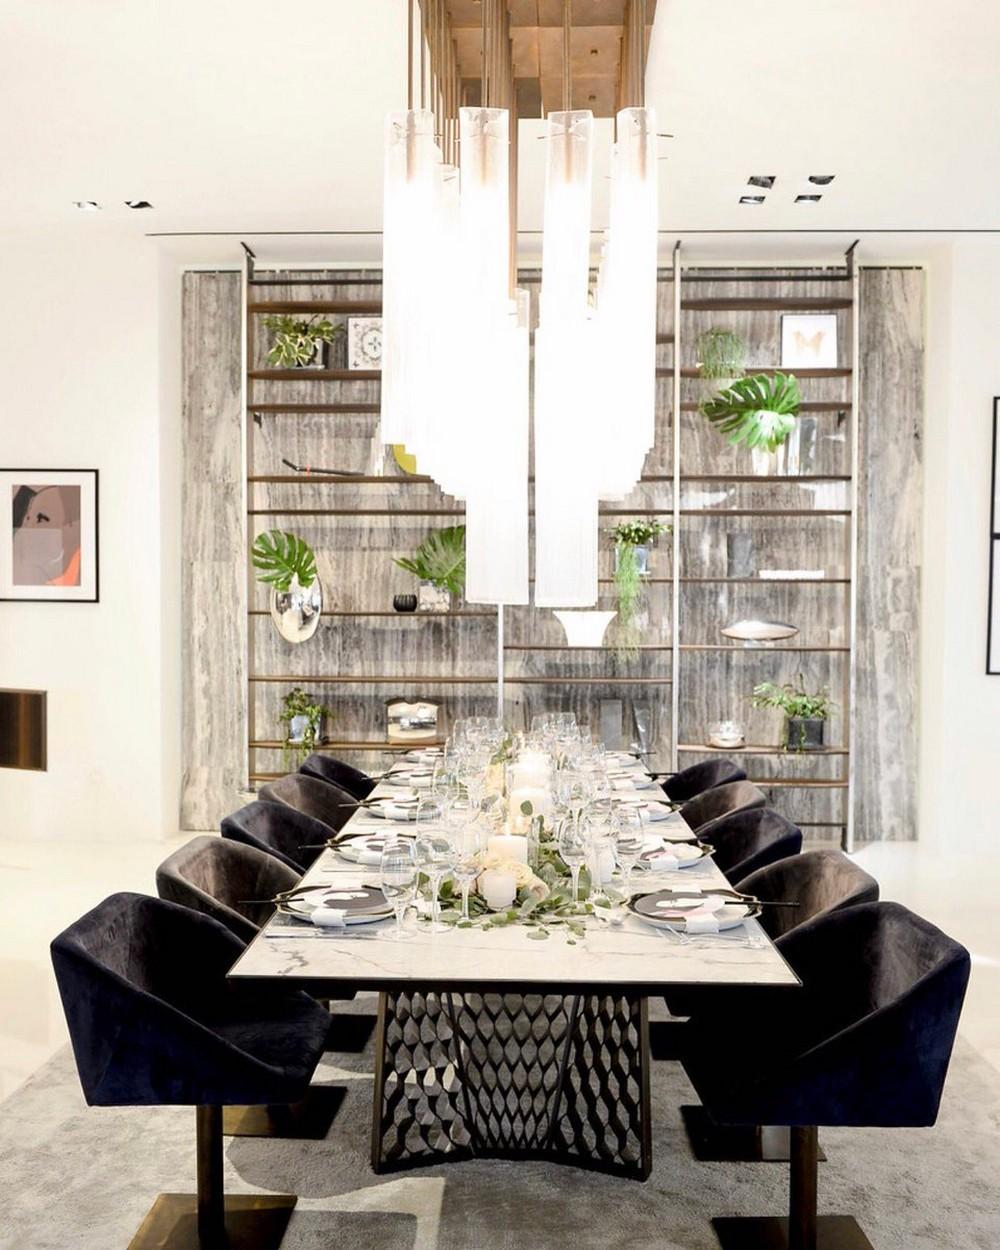 nate berkus Dining Room Projects by Nate Berkus 4 Twitter